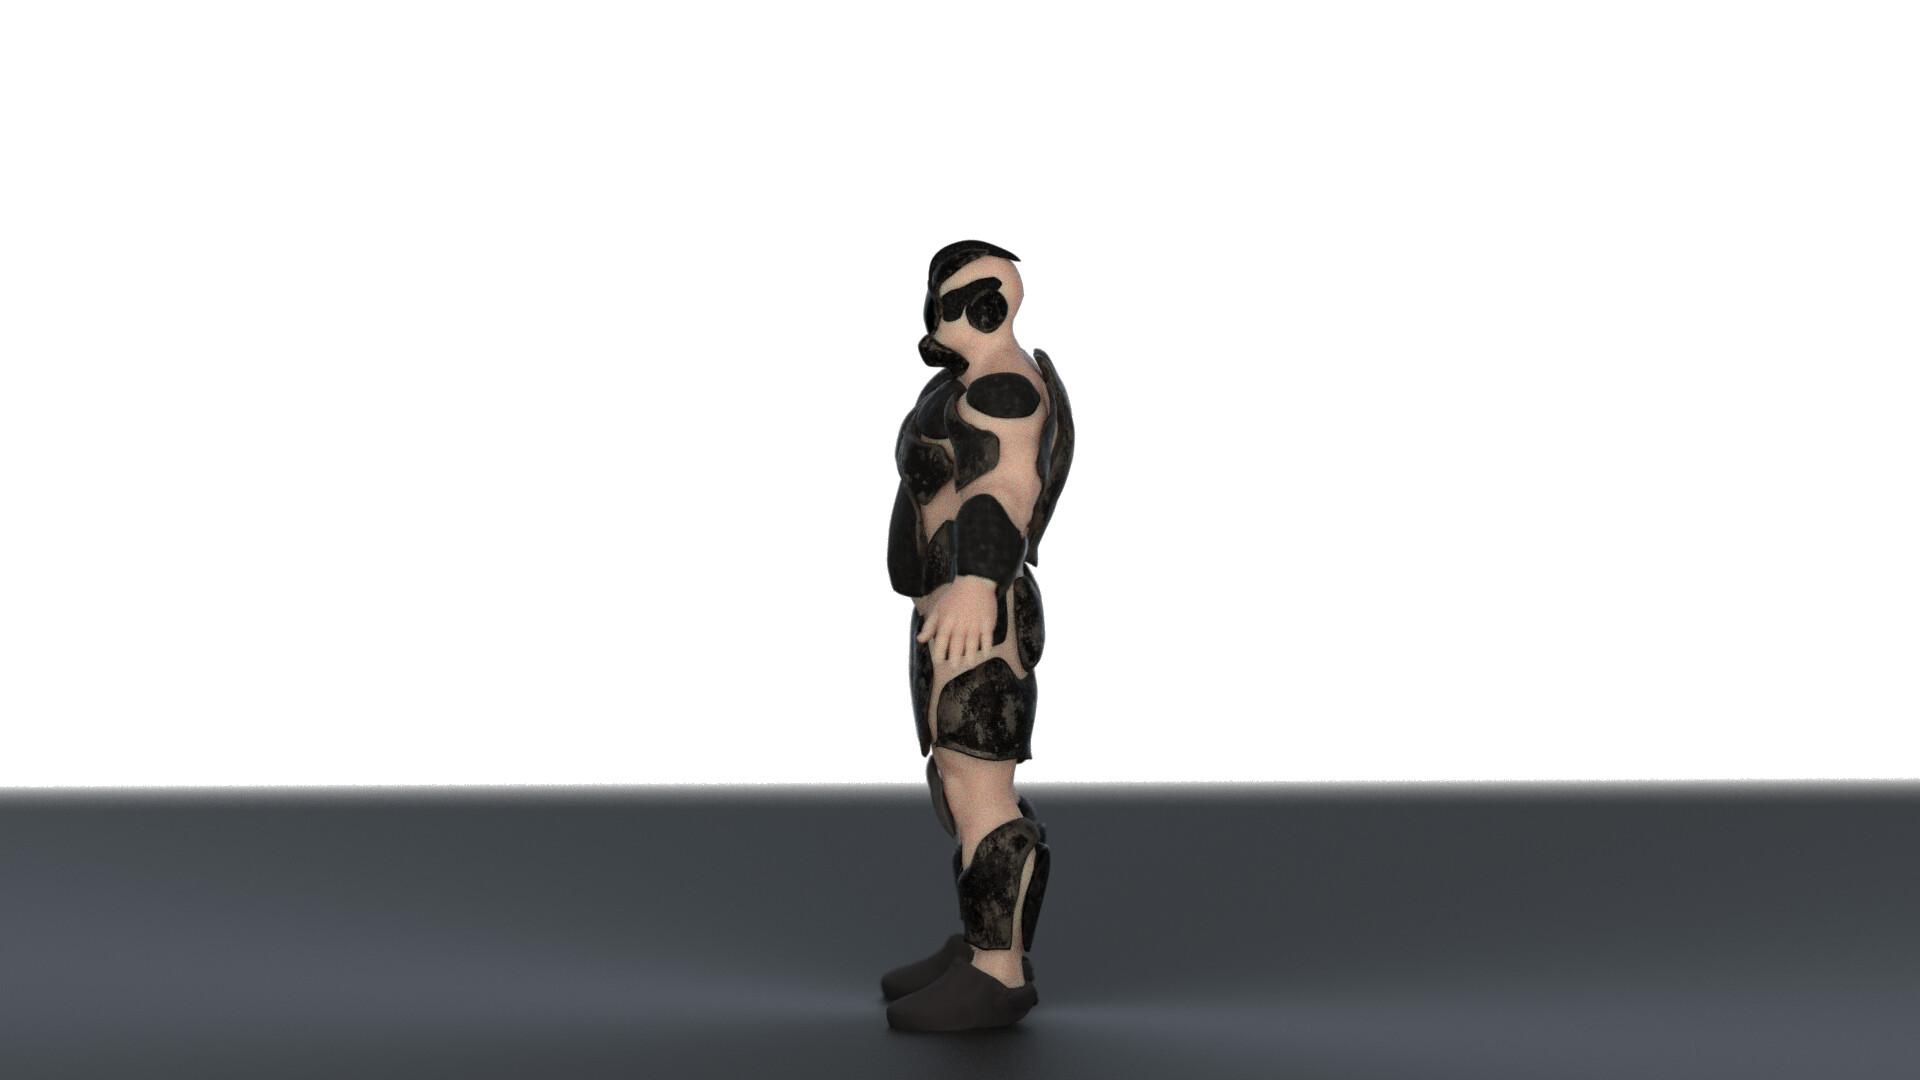 Kris hyde side ortho